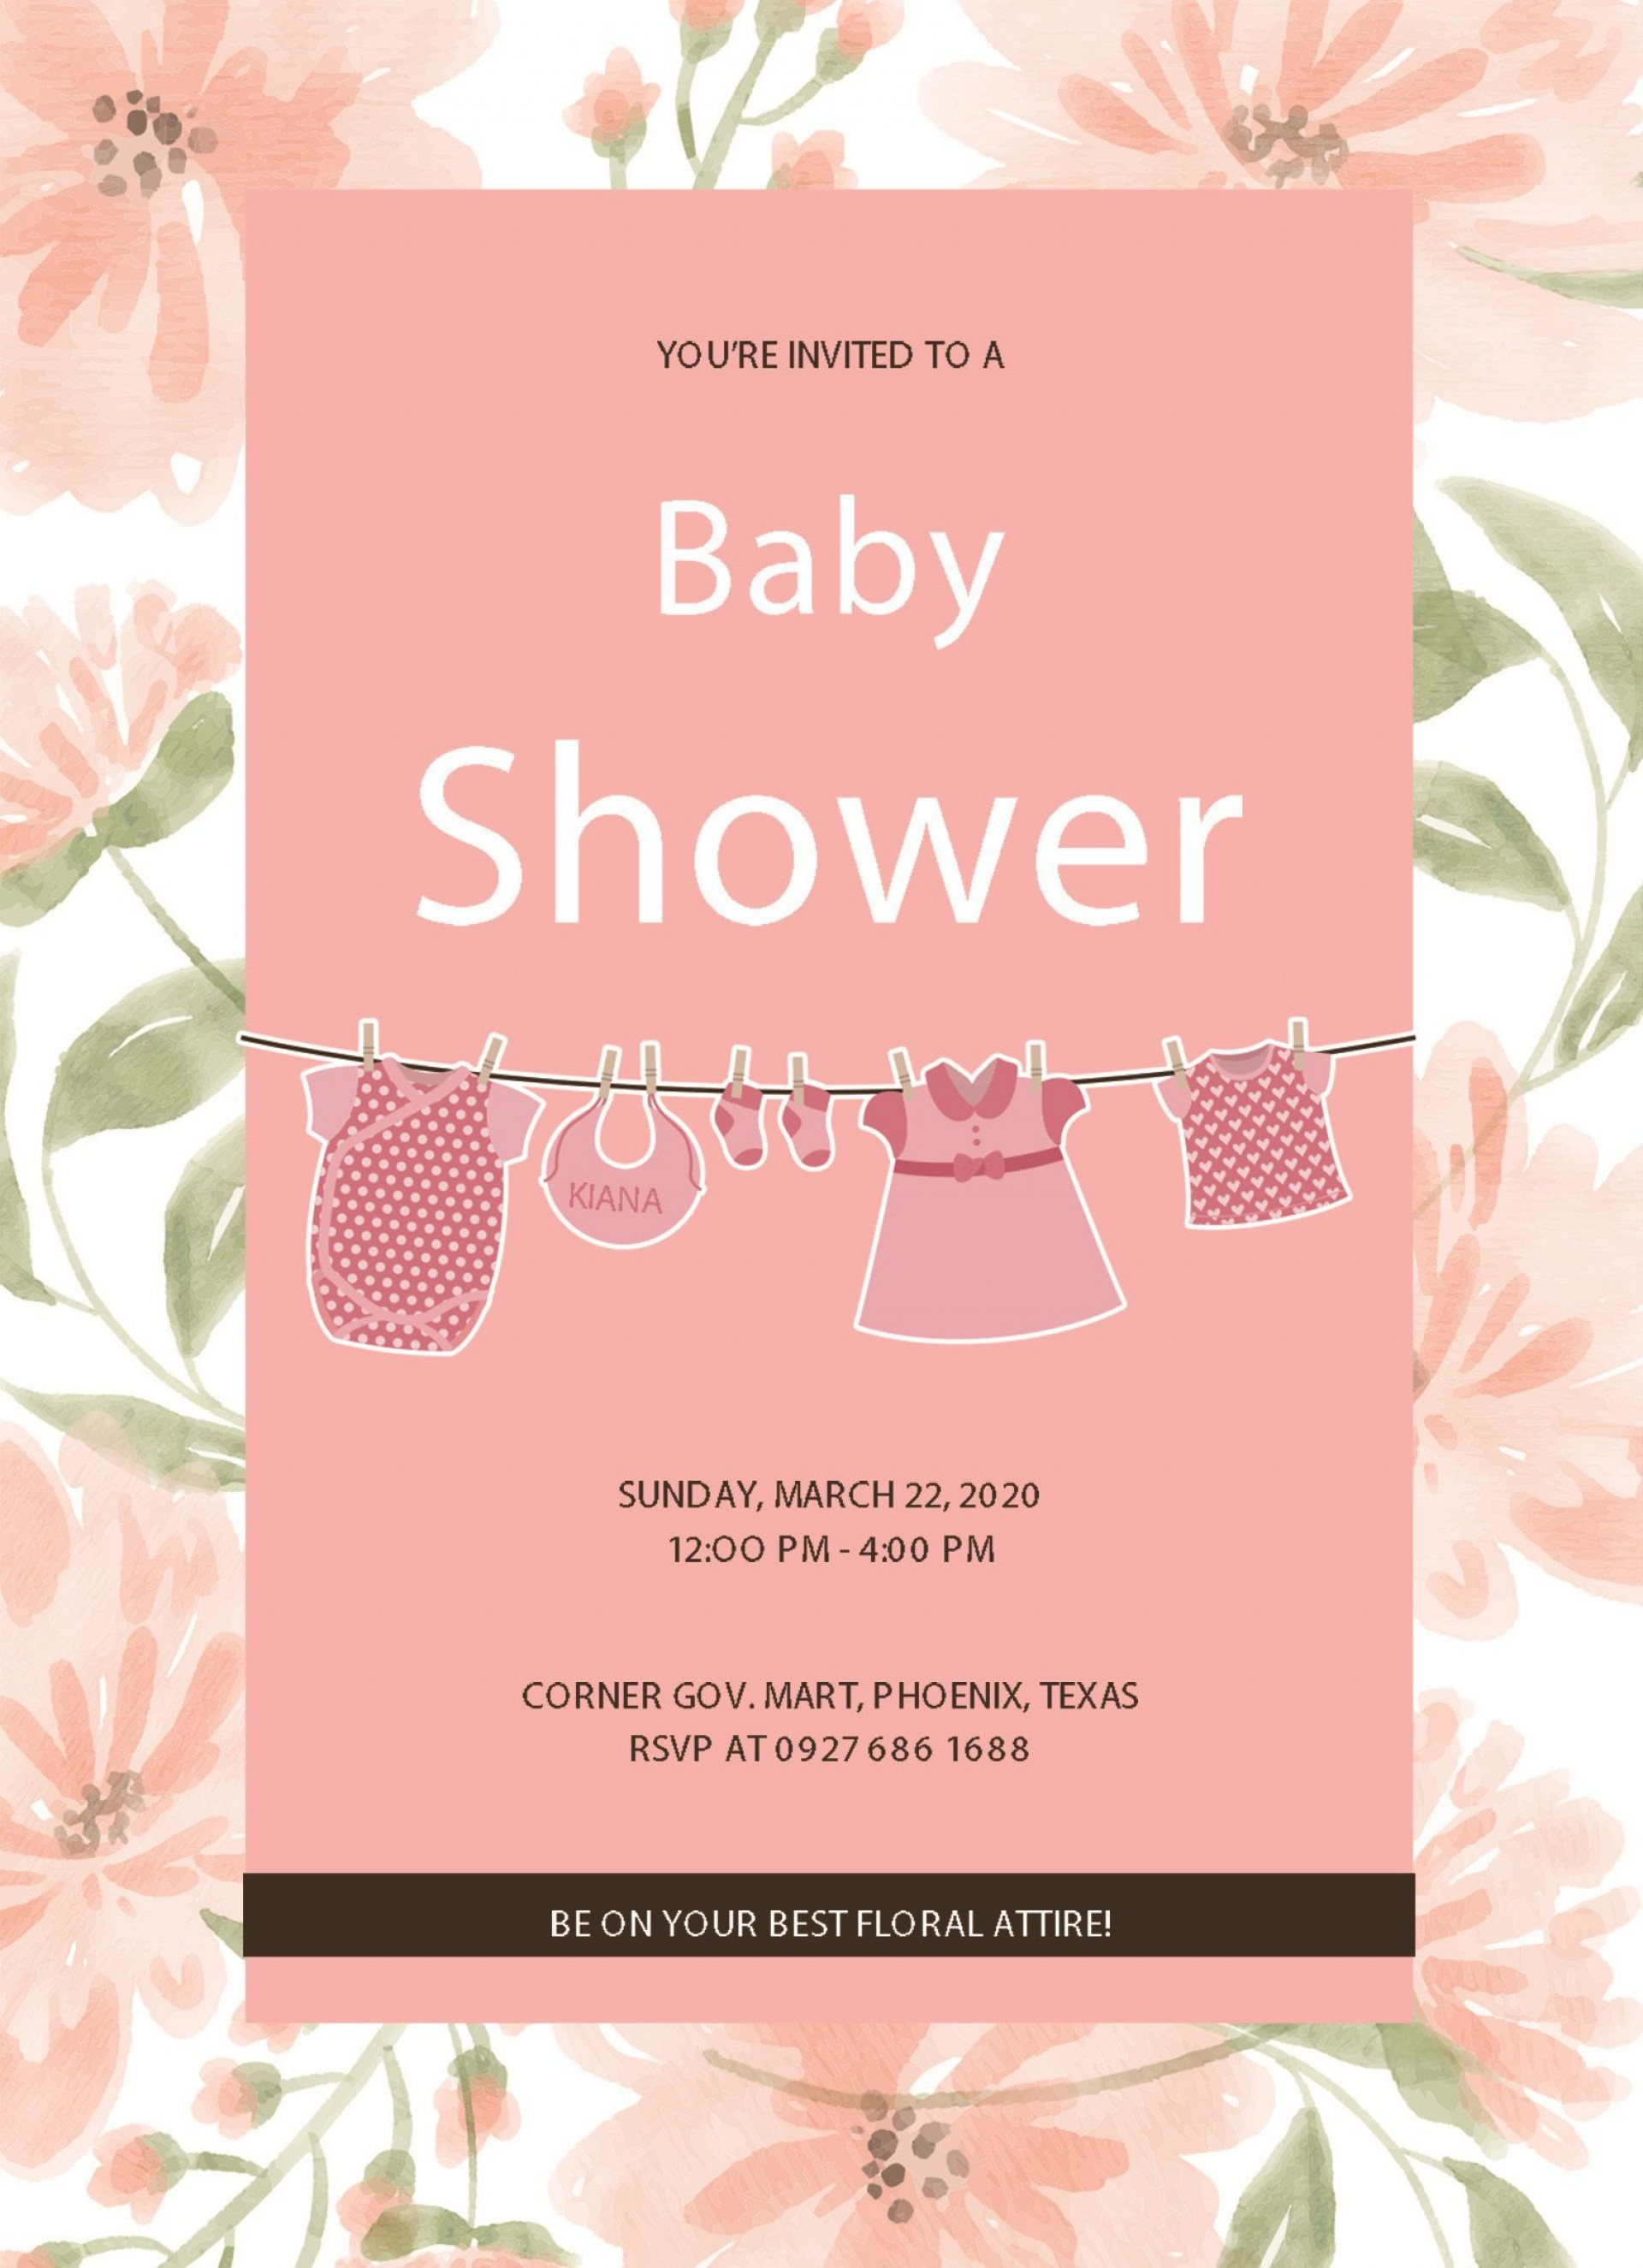 005 Breathtaking Baby Shower Invitation Template Editable High Resolution  Free Surprise In Gujarati Twin1920